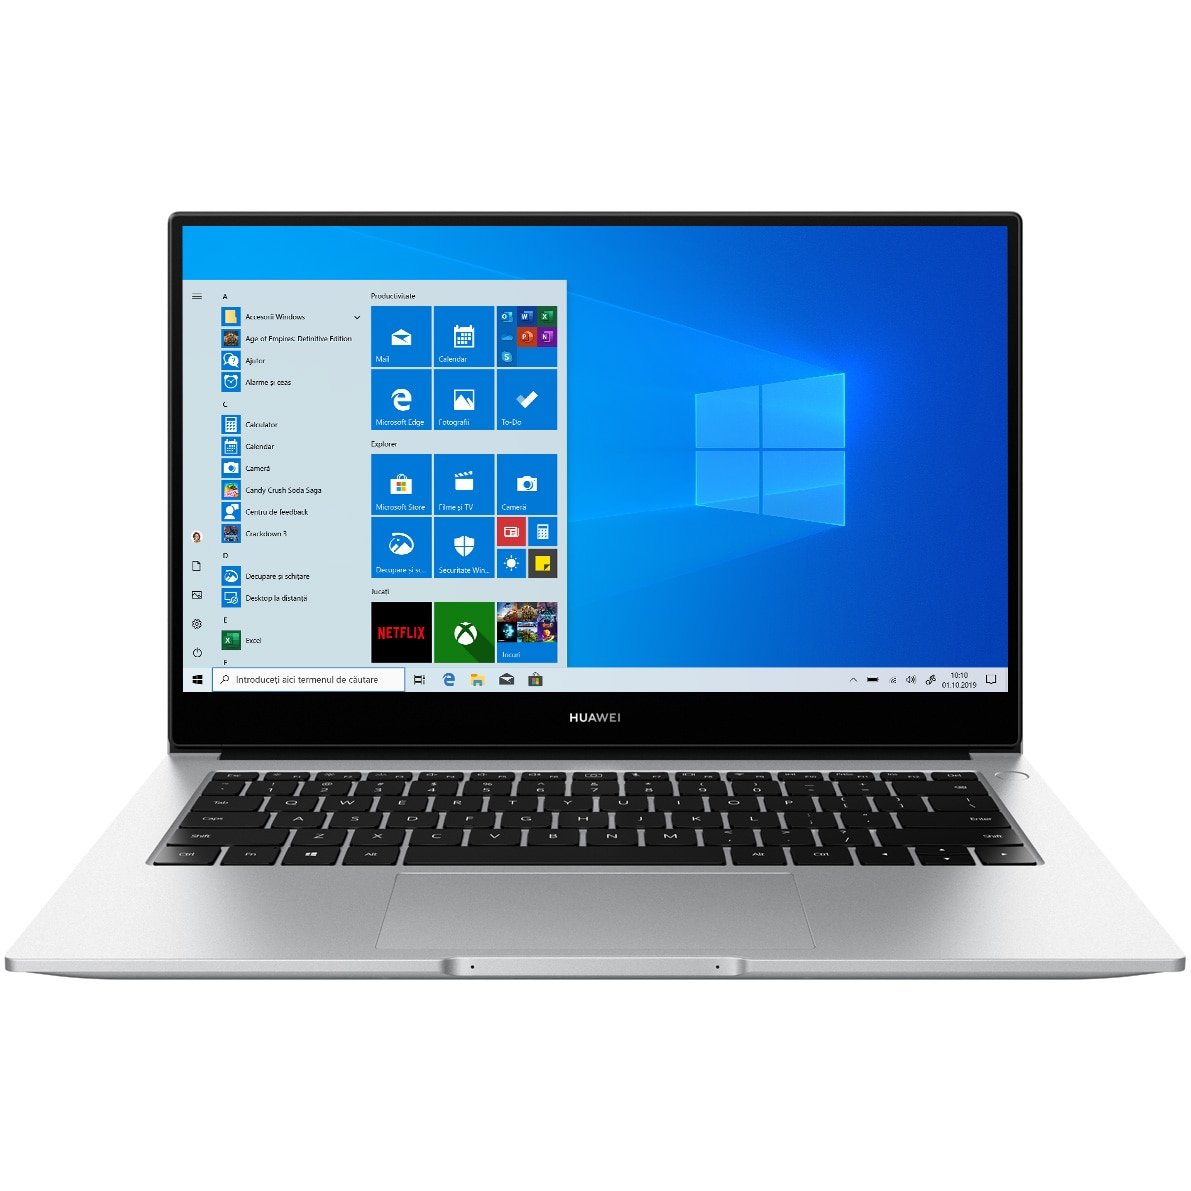 "Fotografie Laptop ultraportabil Huawei MateBook D14 2020 cu procesor AMD Ryzen™ 7 3700U pana la 4.00 GHz, 14"", Full HD, 8GB, 512GB SSD, AMD Radeon Graphics, Windows Home, Silver"